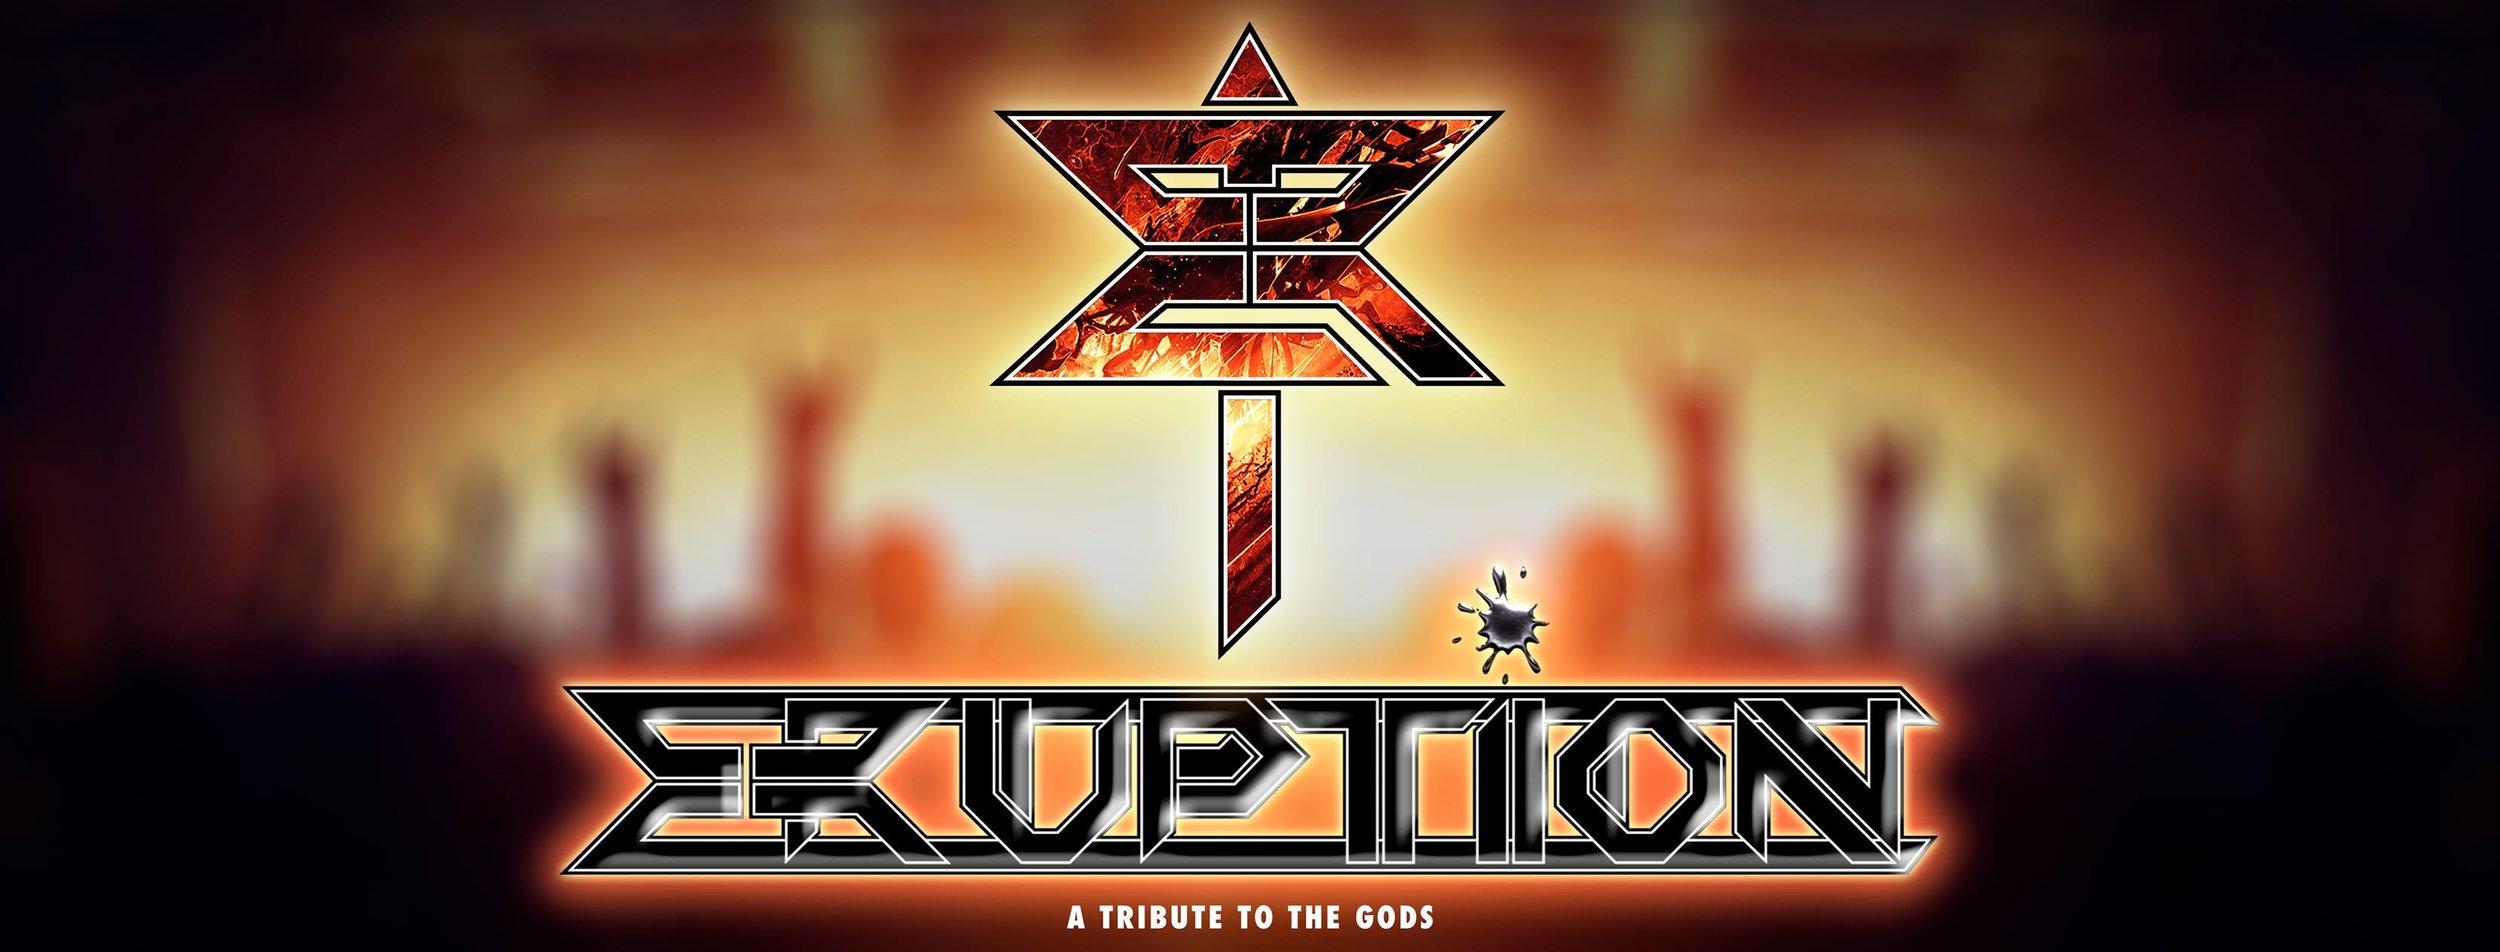 logo design eruption facebook cover grafico